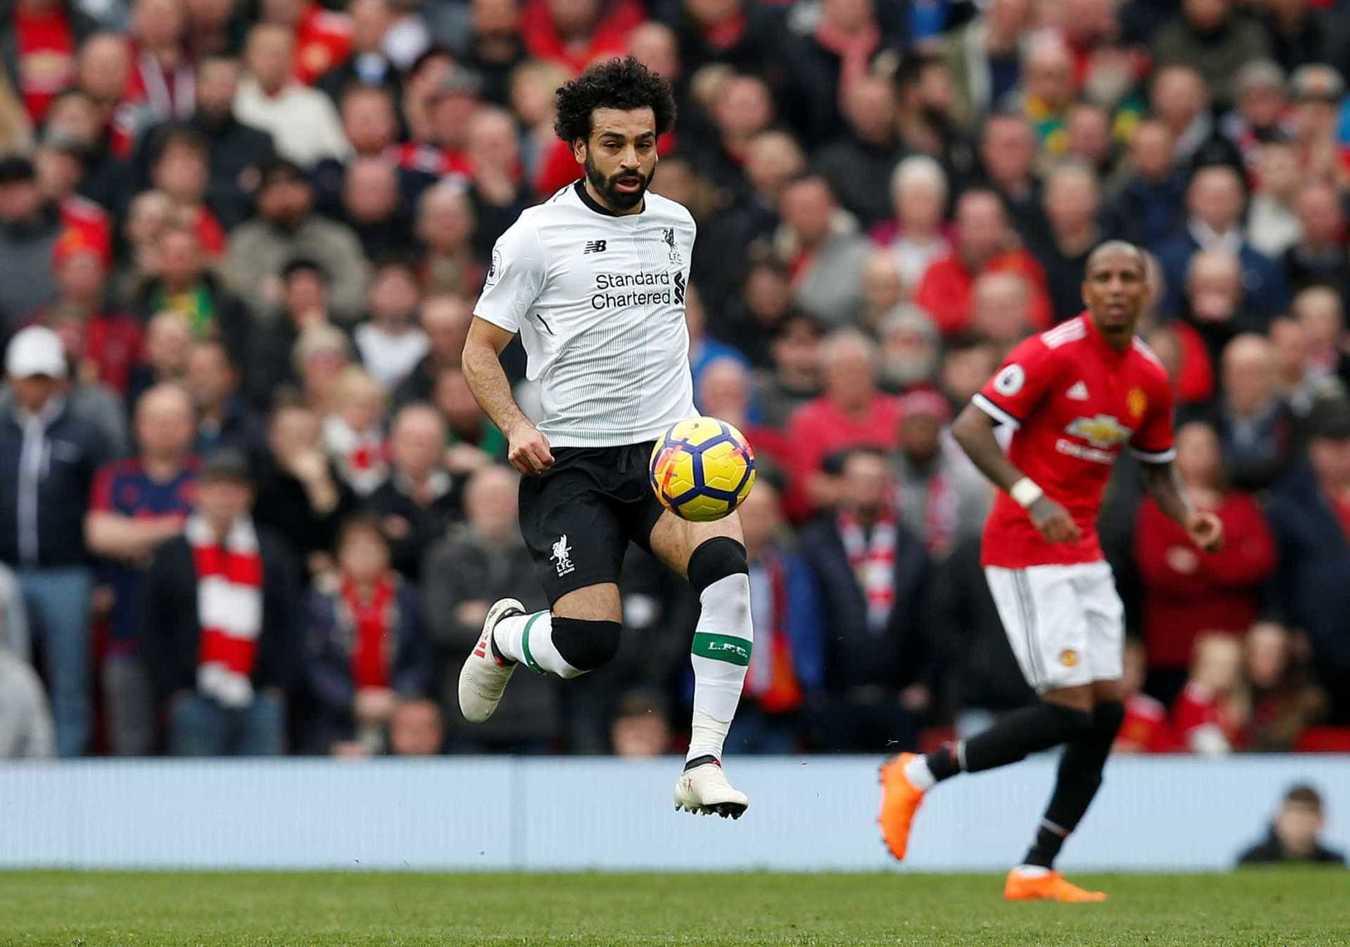 1º Mohammed Salah, Liverpol: 88,1 milhões de euros -> 162,8 milhões de euros